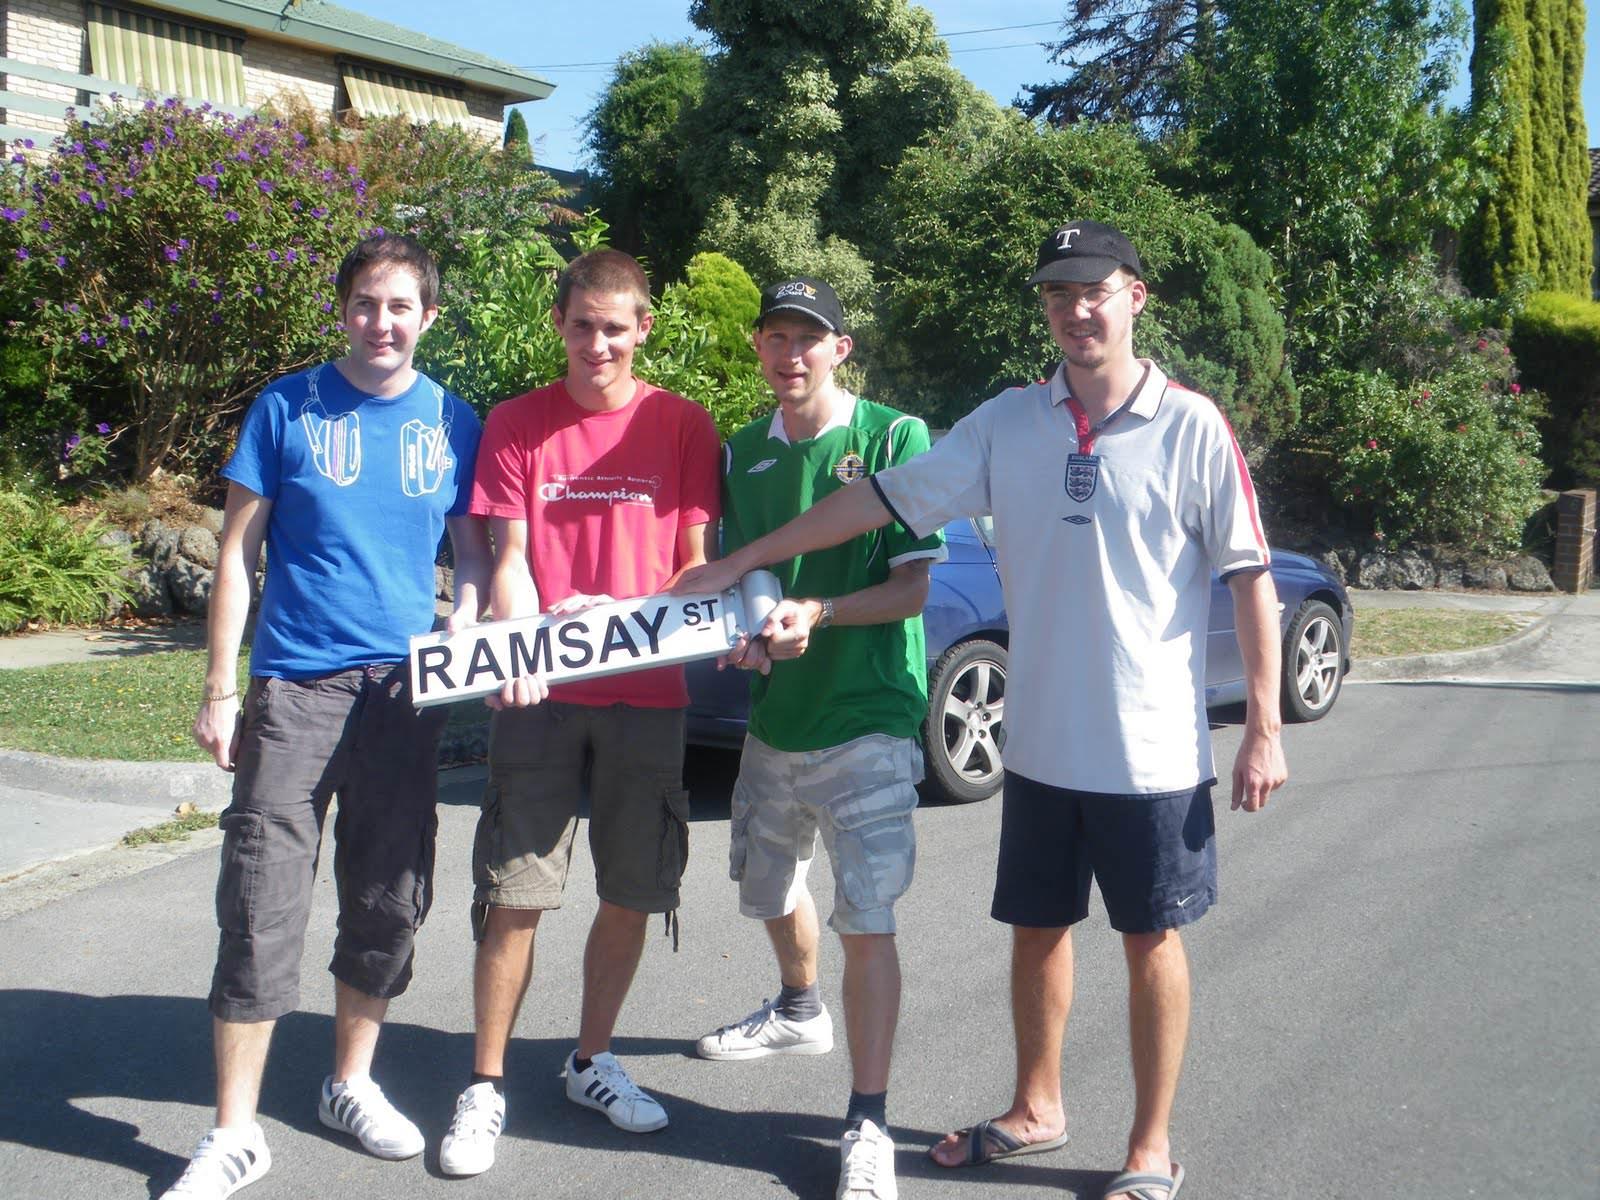 neighbours ramsay street